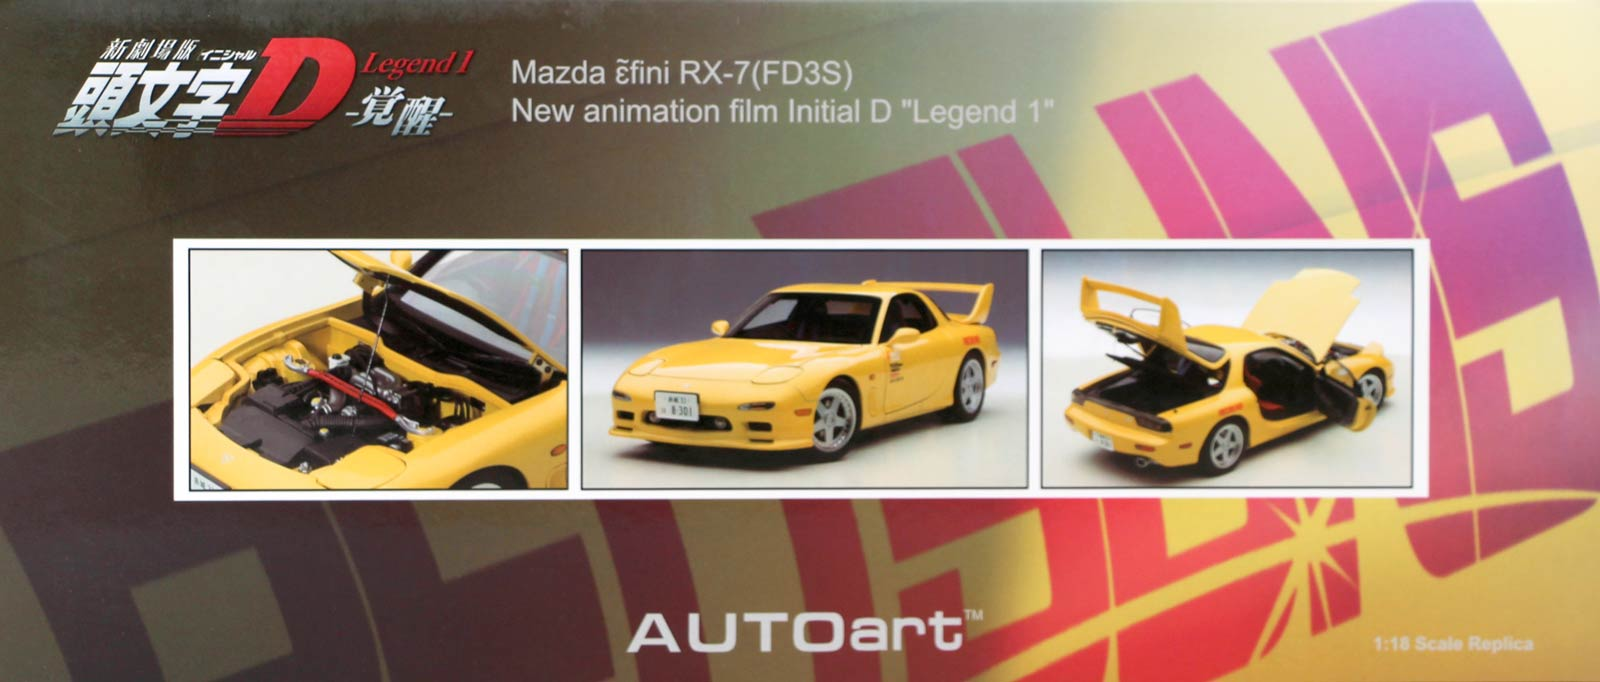 Mazda RX 7 - AUTOart - Initial D - packaging face